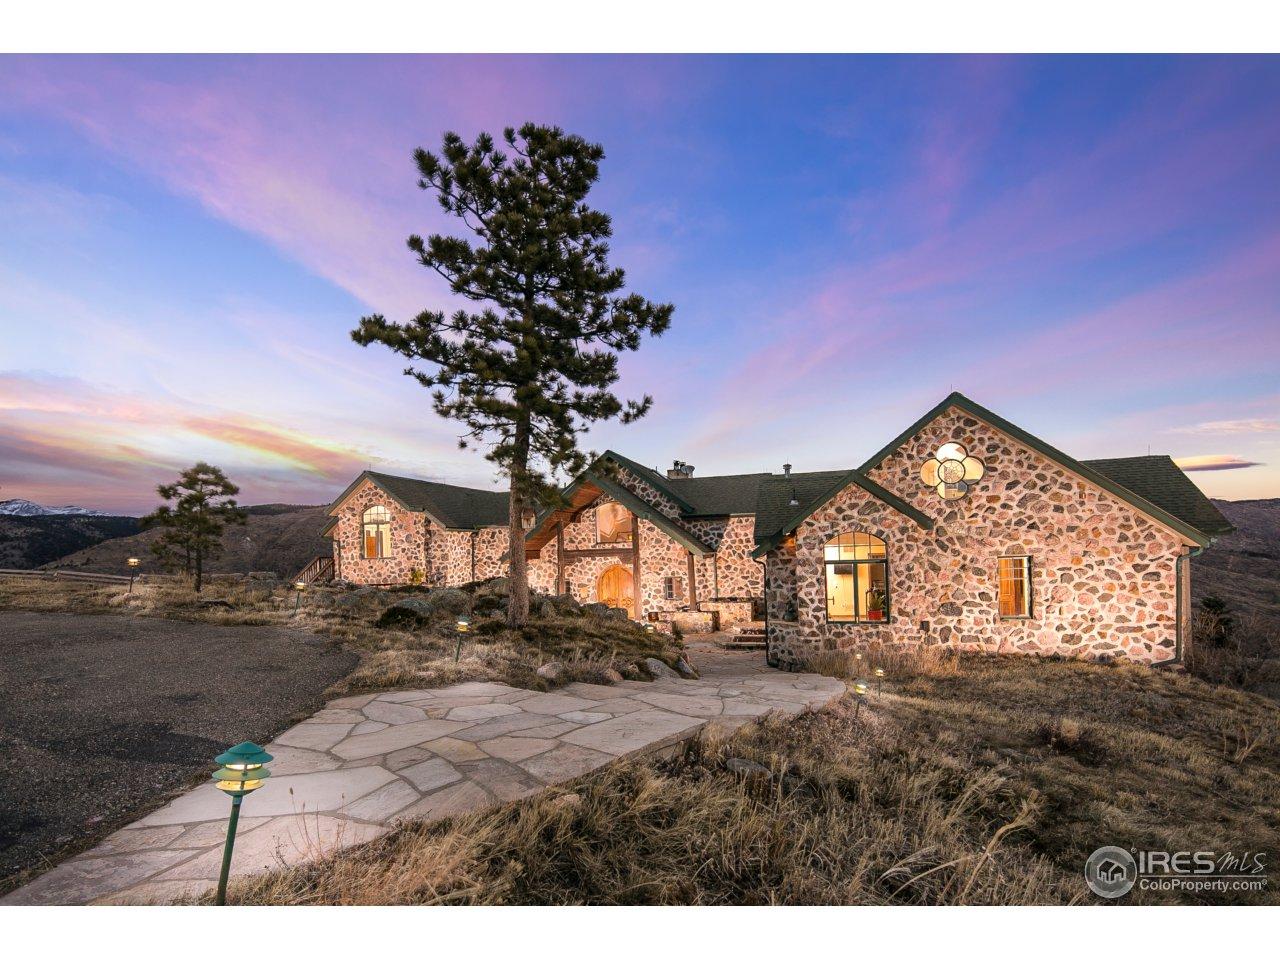 355 Mountain King Rd, Boulder CO 80302